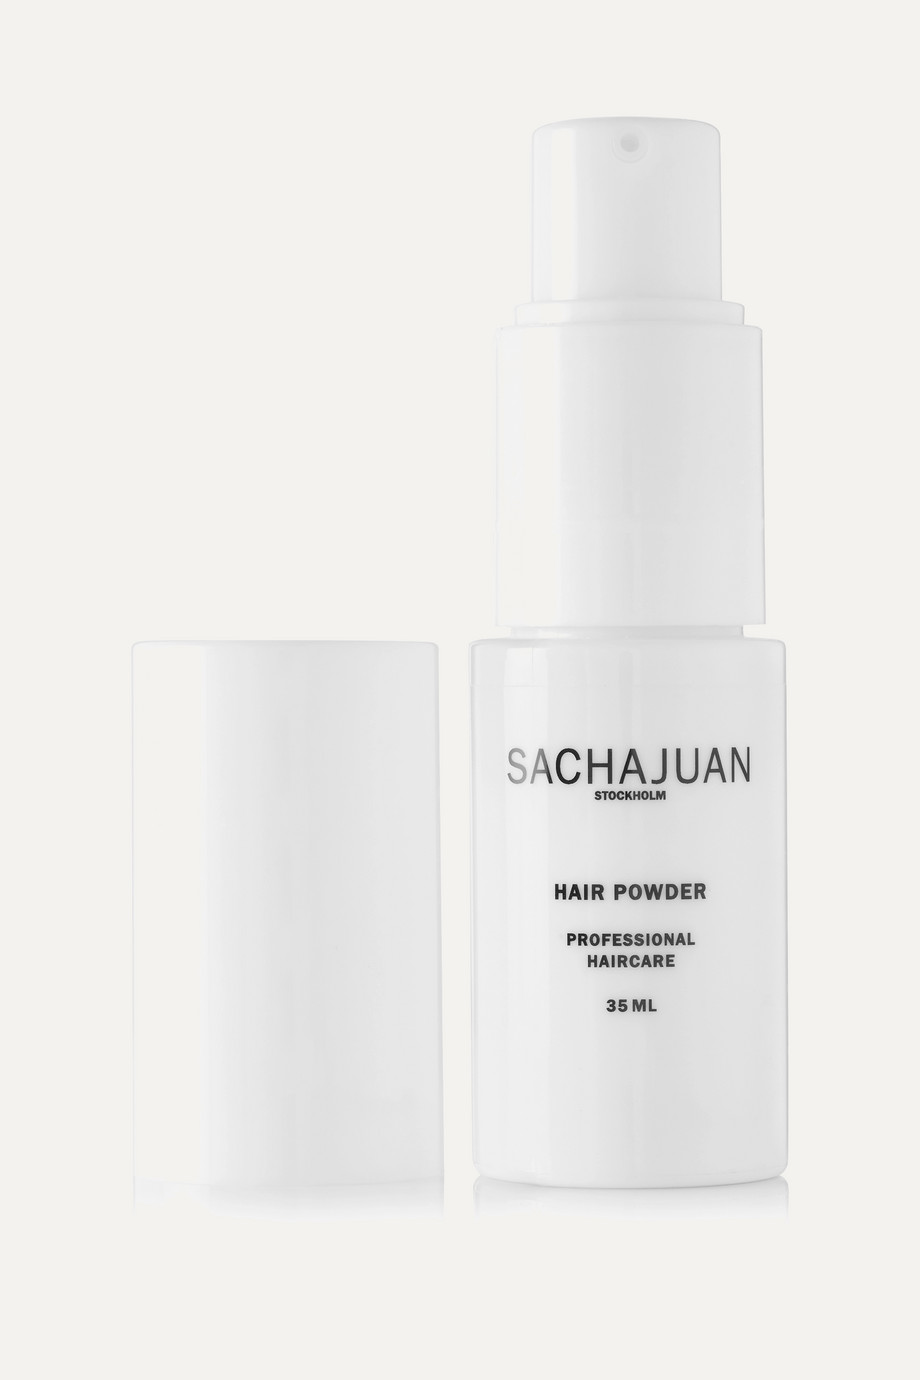 SACHAJUAN Hair Powder, 35 ml – Haarpuder